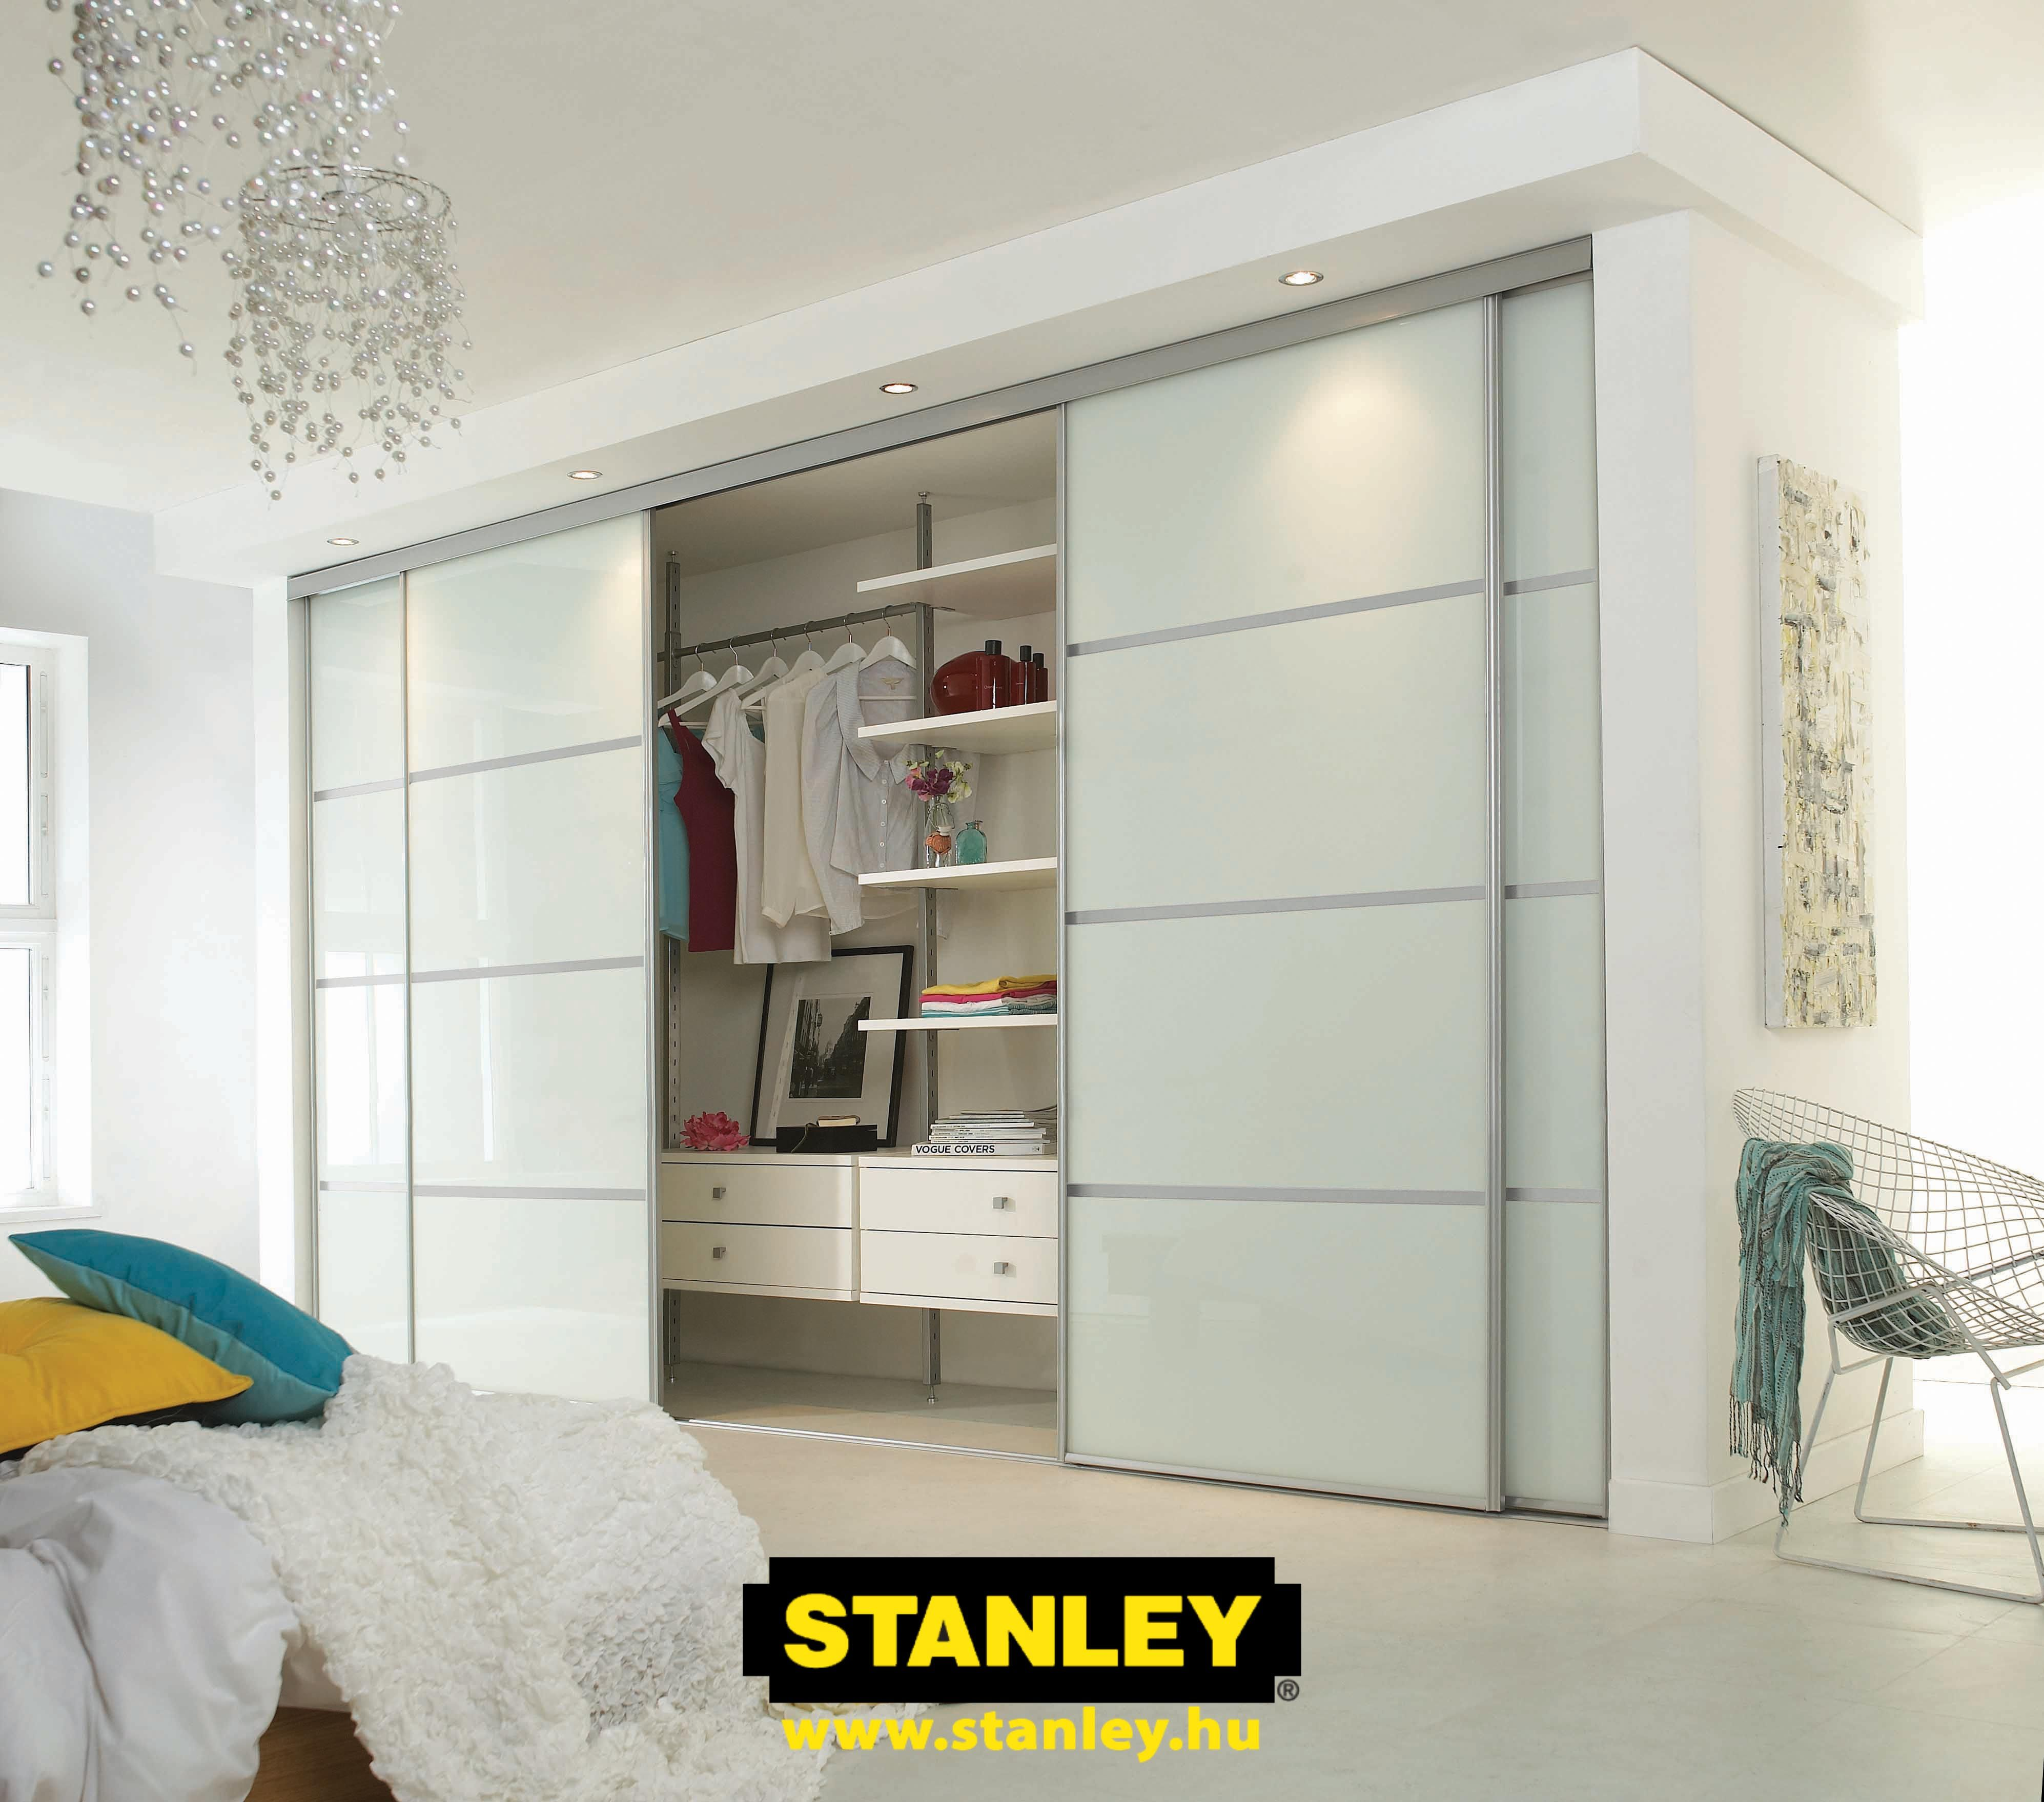 covers knobs sliding and closet photo locks door